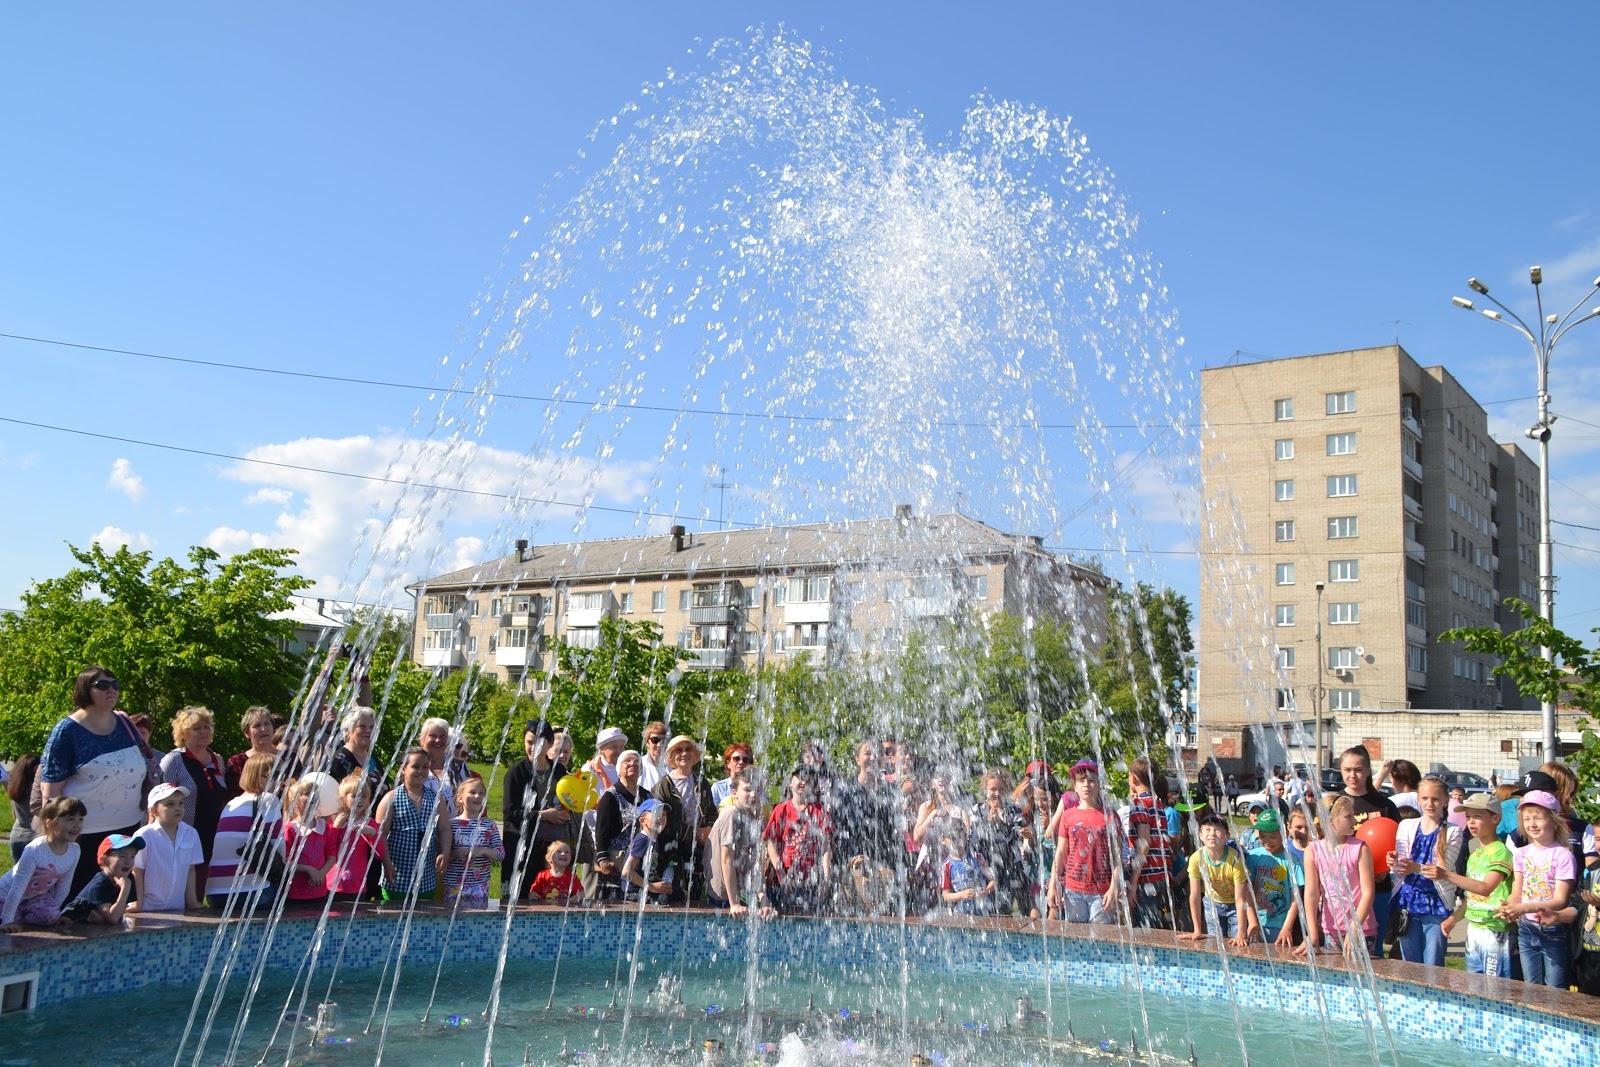 Парк культуры и отдыха города Бердска, Бердск